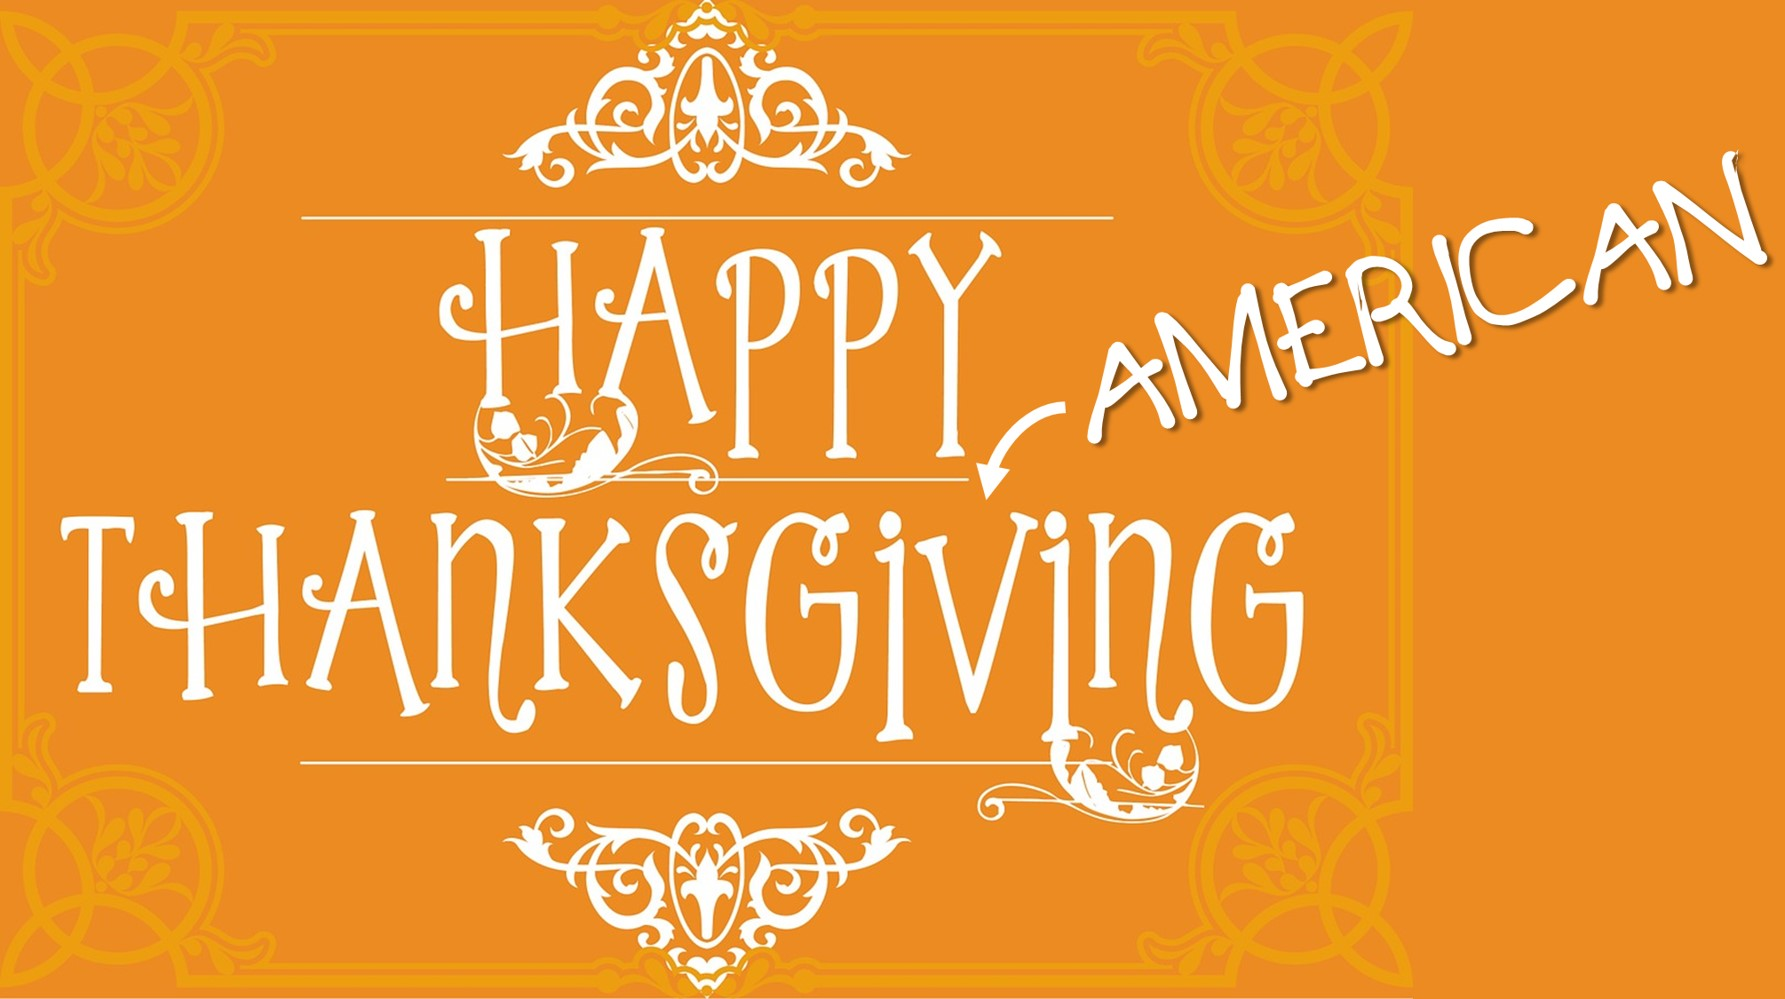 us thanksgiving.jpg